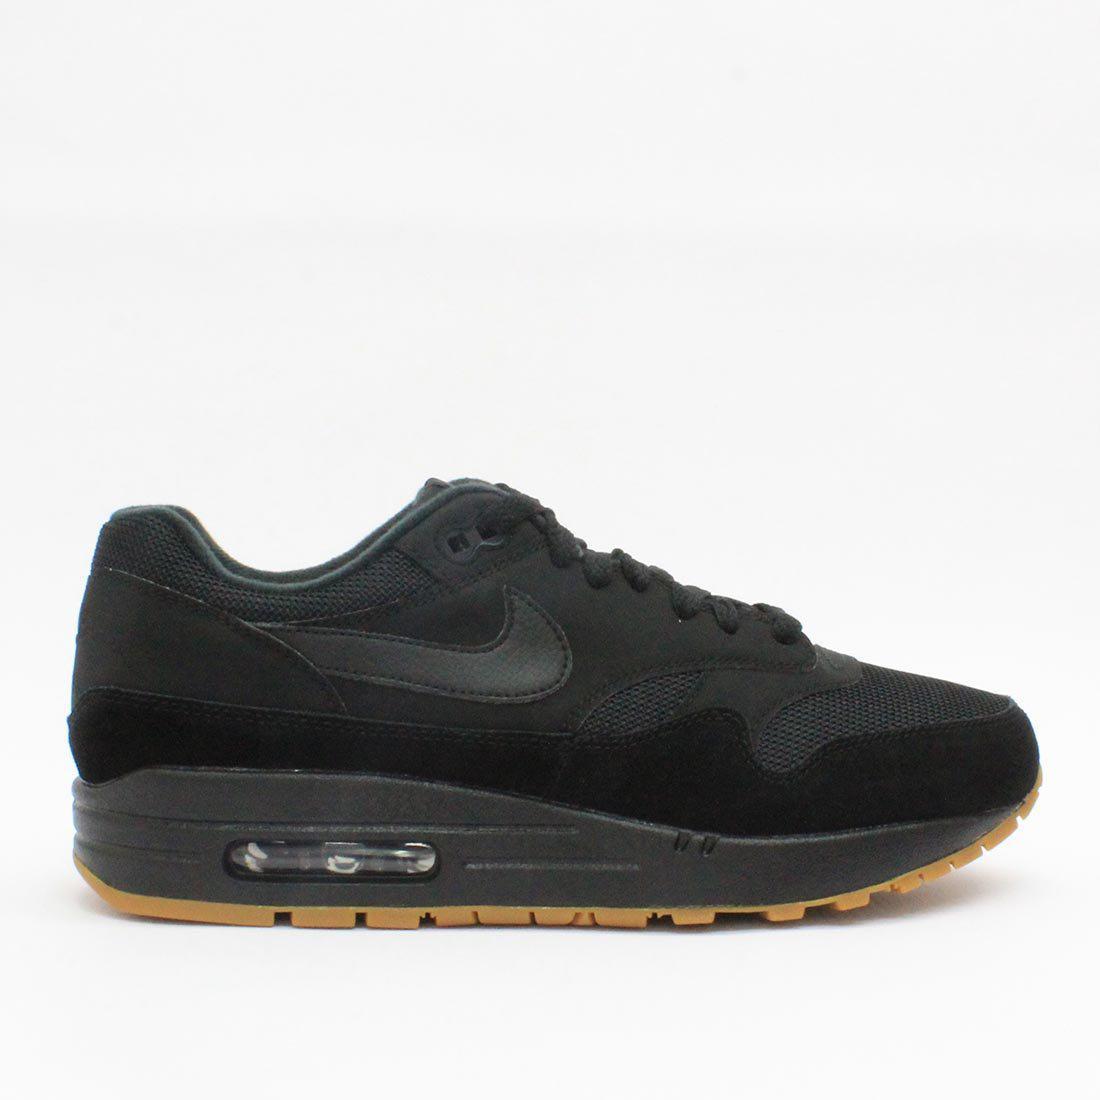 Mens Shoes Nike Air Max 1 Cool Grey AH8145 005